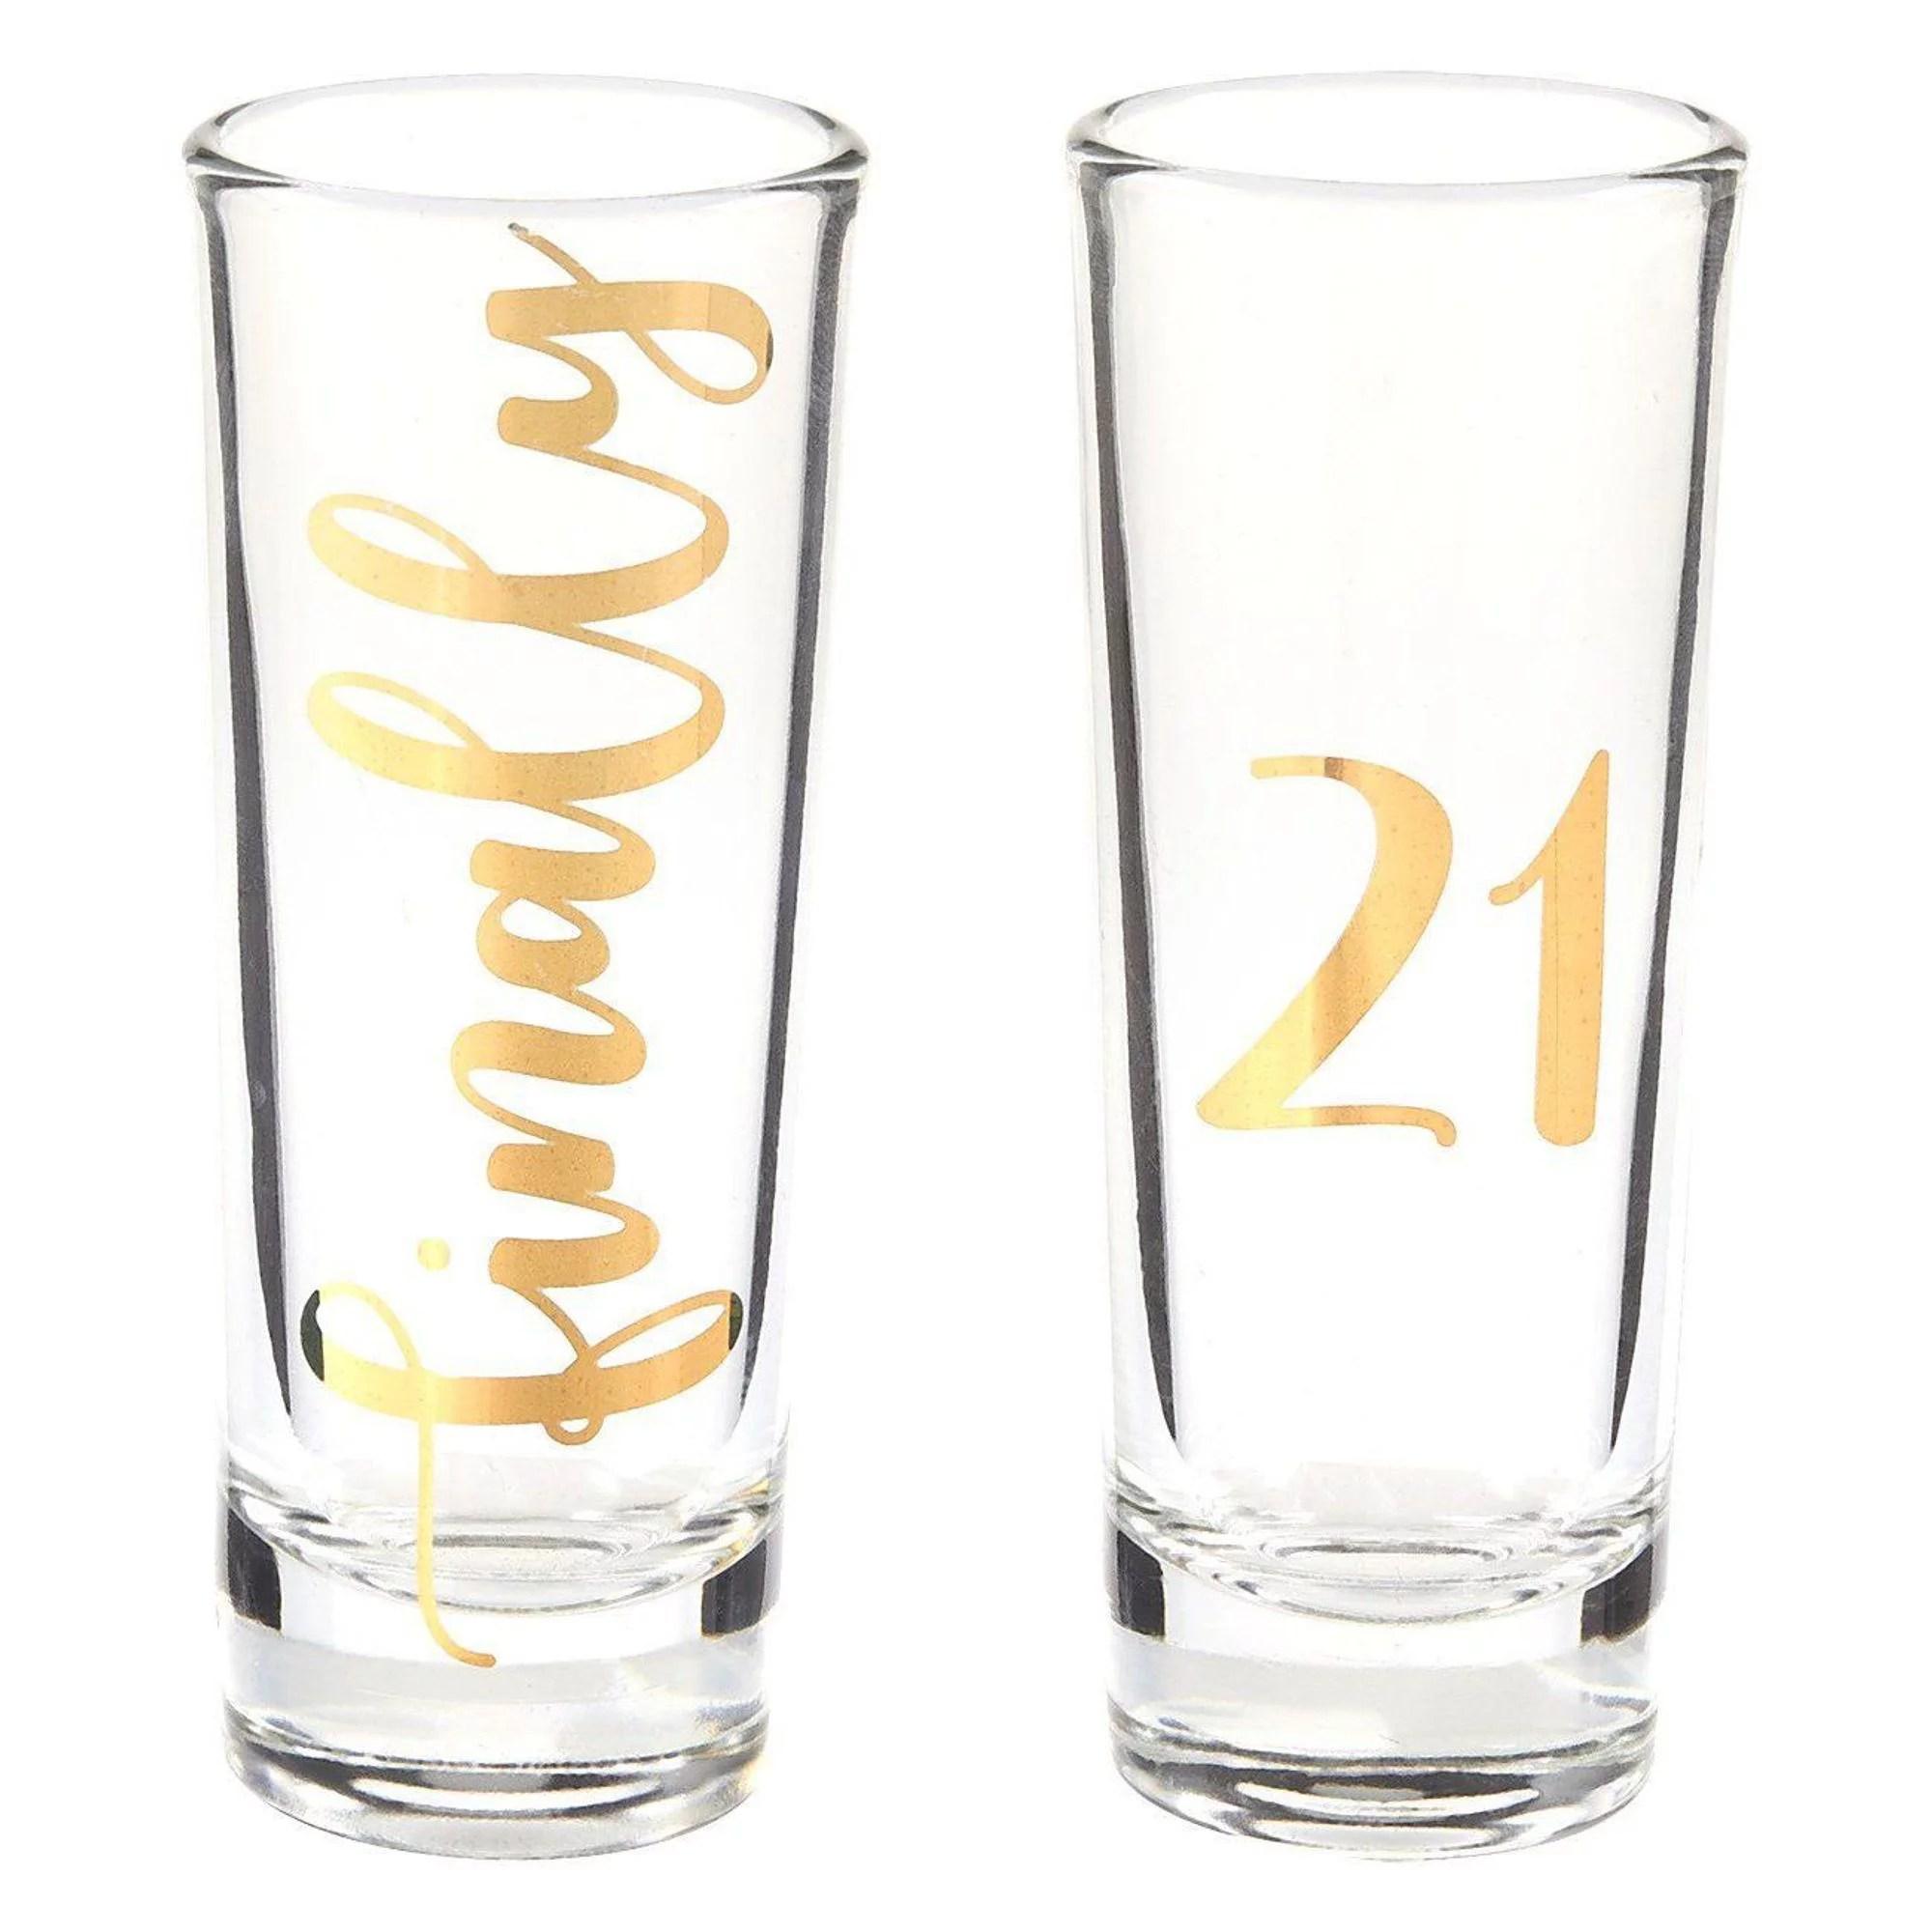 Finally 21 Shot Glasses 21st Birthday Novelty Gifts Party Favors Celebrate Turning Twenty One Legal Drinking Age Set Of 2 2 Oz Each Walmart Com Walmart Com